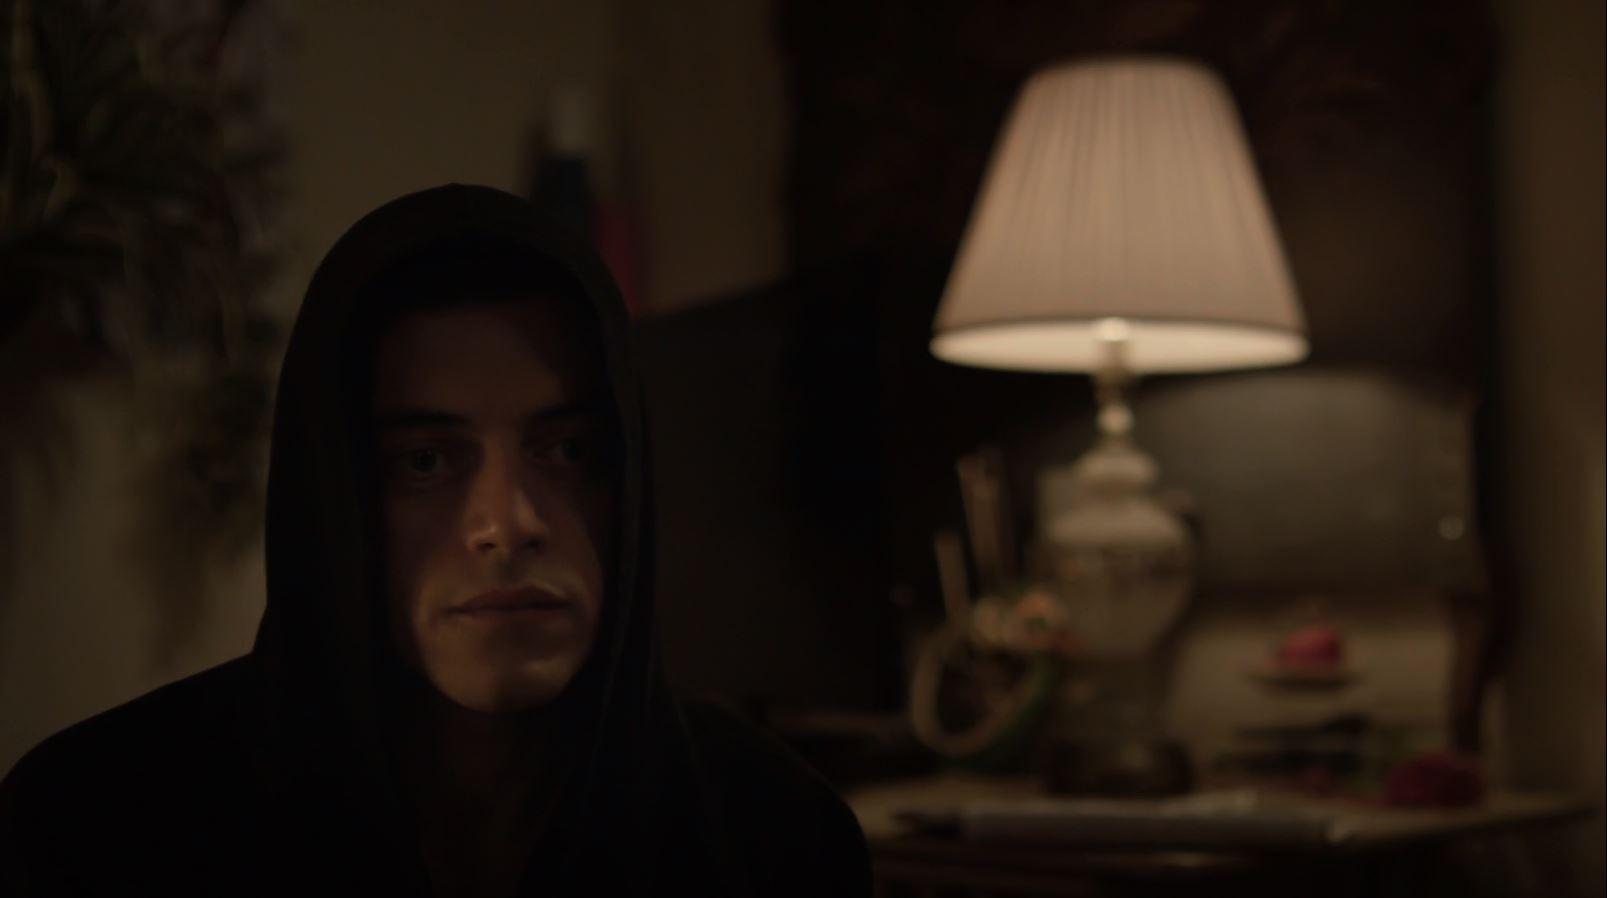 Rami Malek as Elliot. Mr. Robot Episode 2 Review